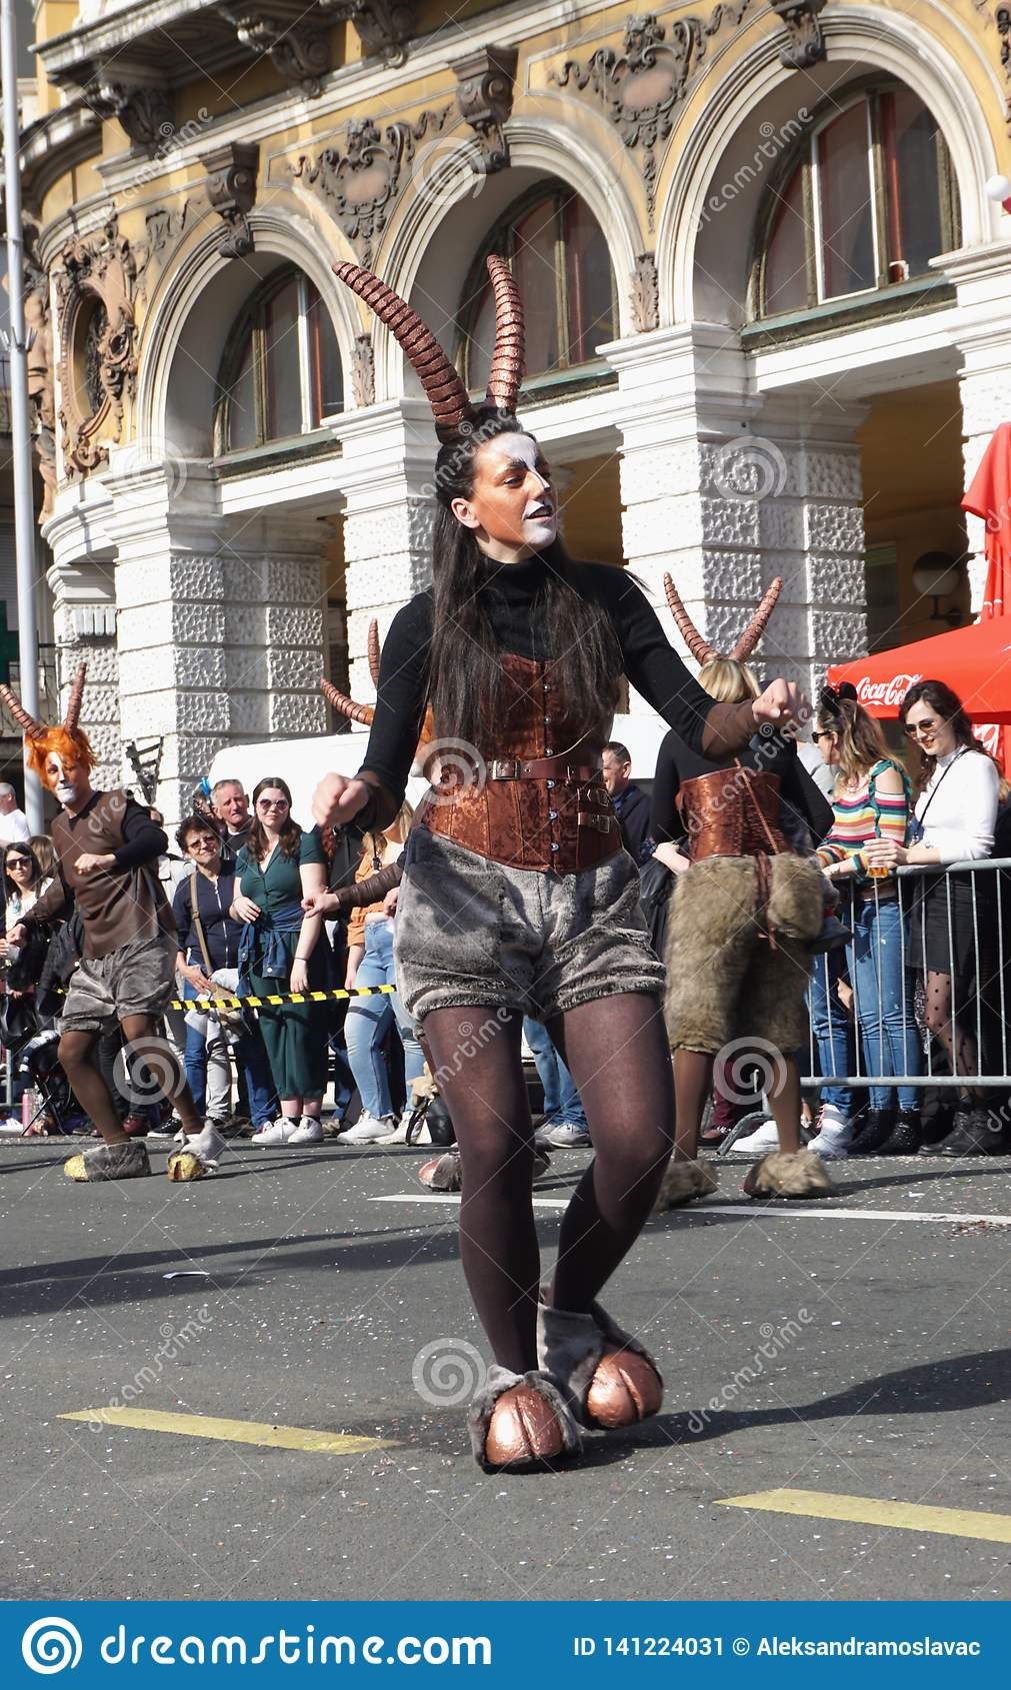 Meisje die die op de straat dansen in de godspan wordt gemaskeerd op de Carnaval-vieringsdag